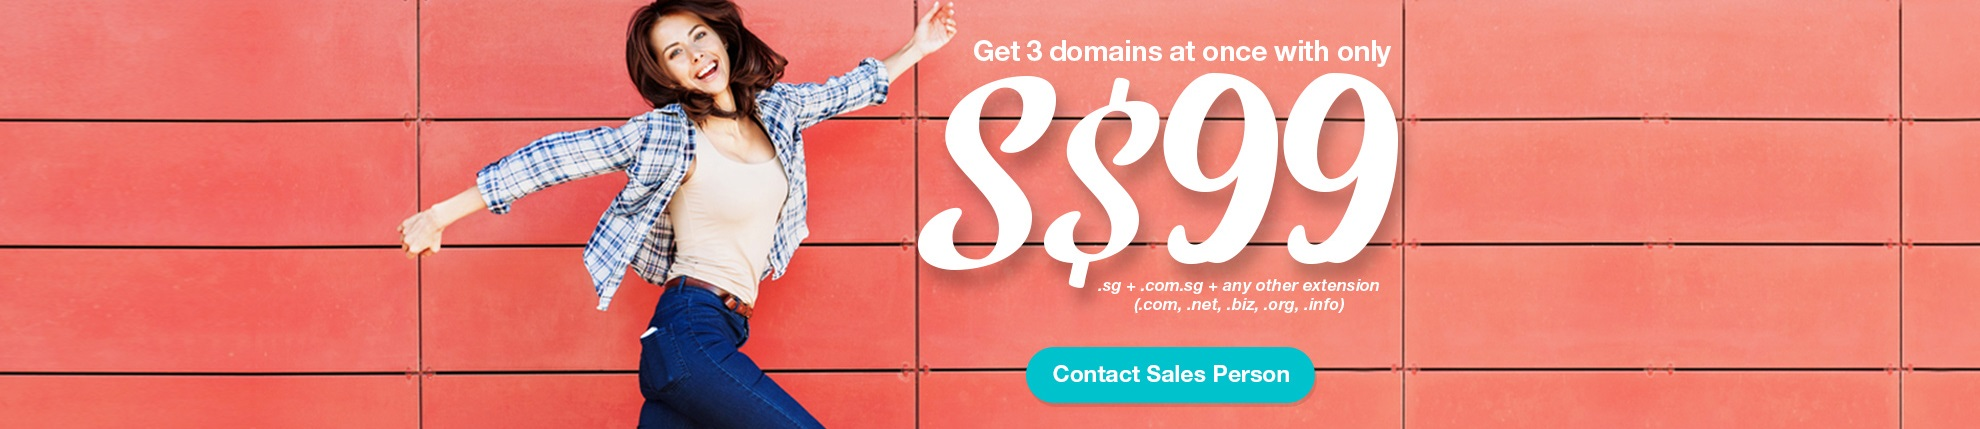 Domain Promotion